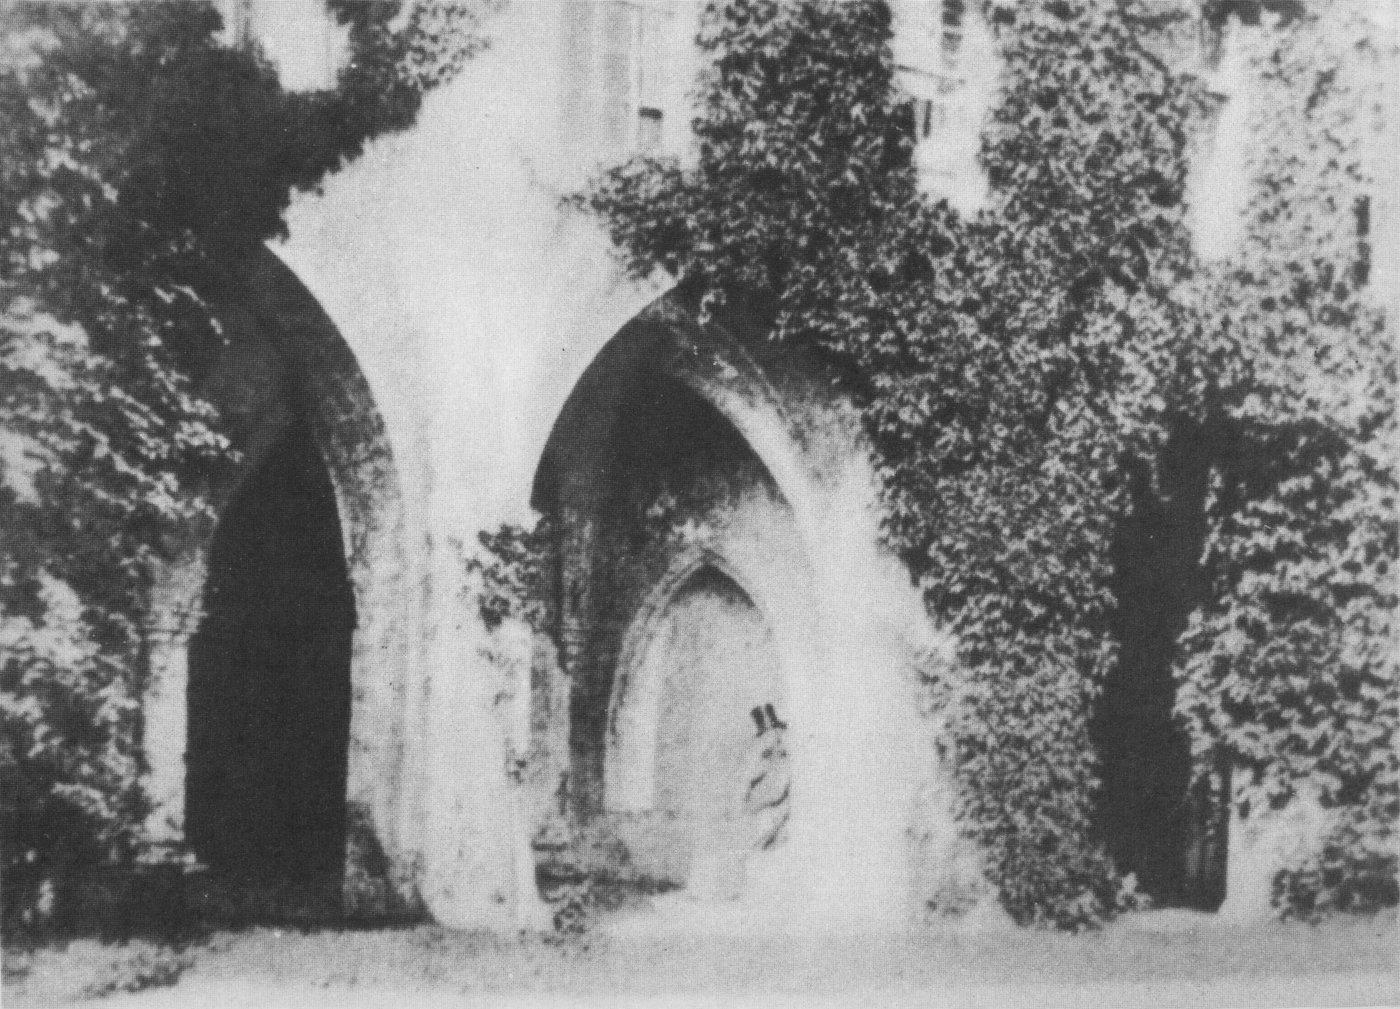 england_monastery_in_lacock_abbey_1844_talbot.jpg